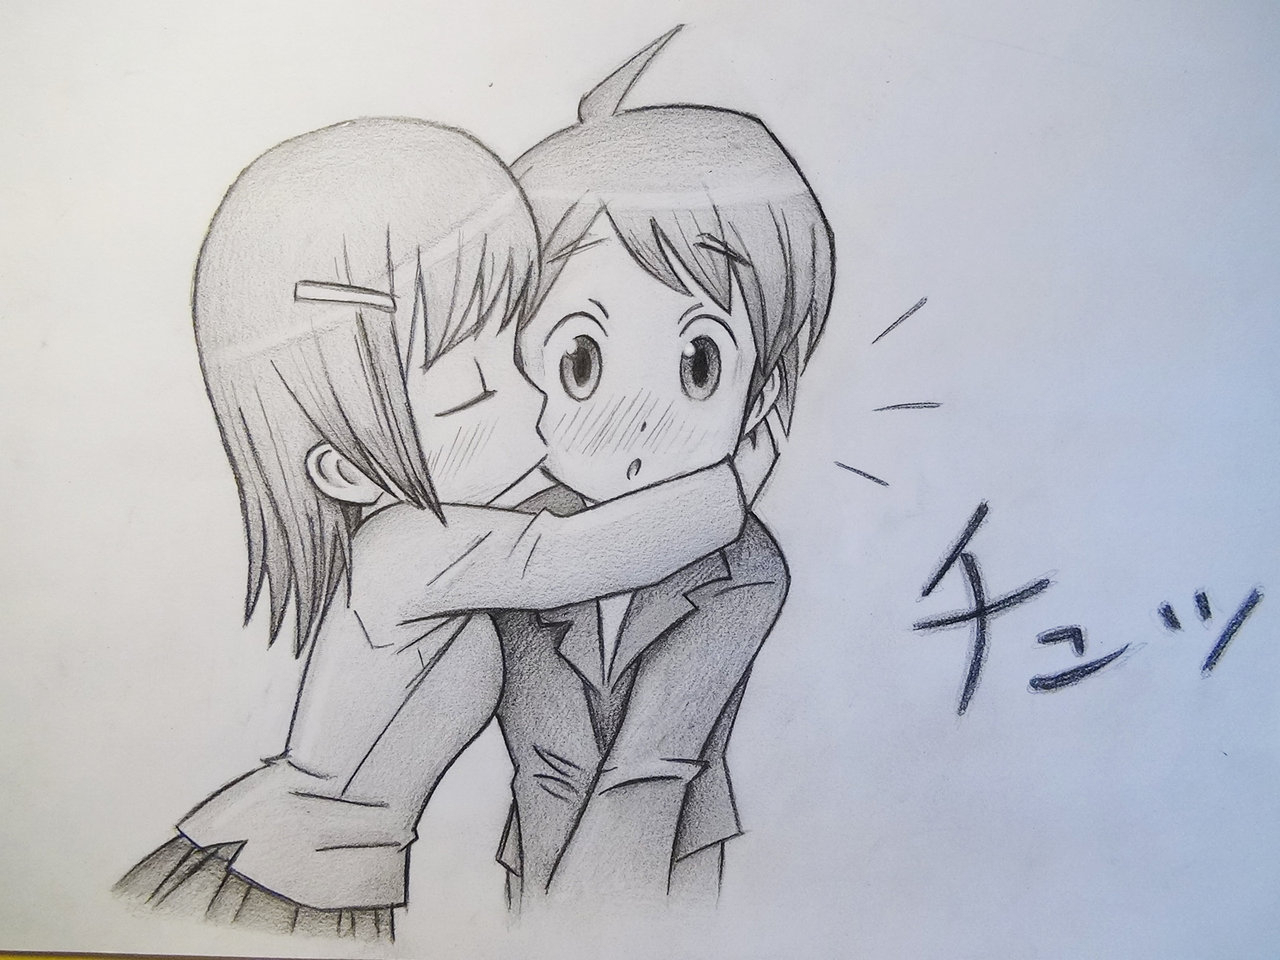 1280x960 Sketch Image Boy And Girl Kissing Drawn Kissing First Kiss